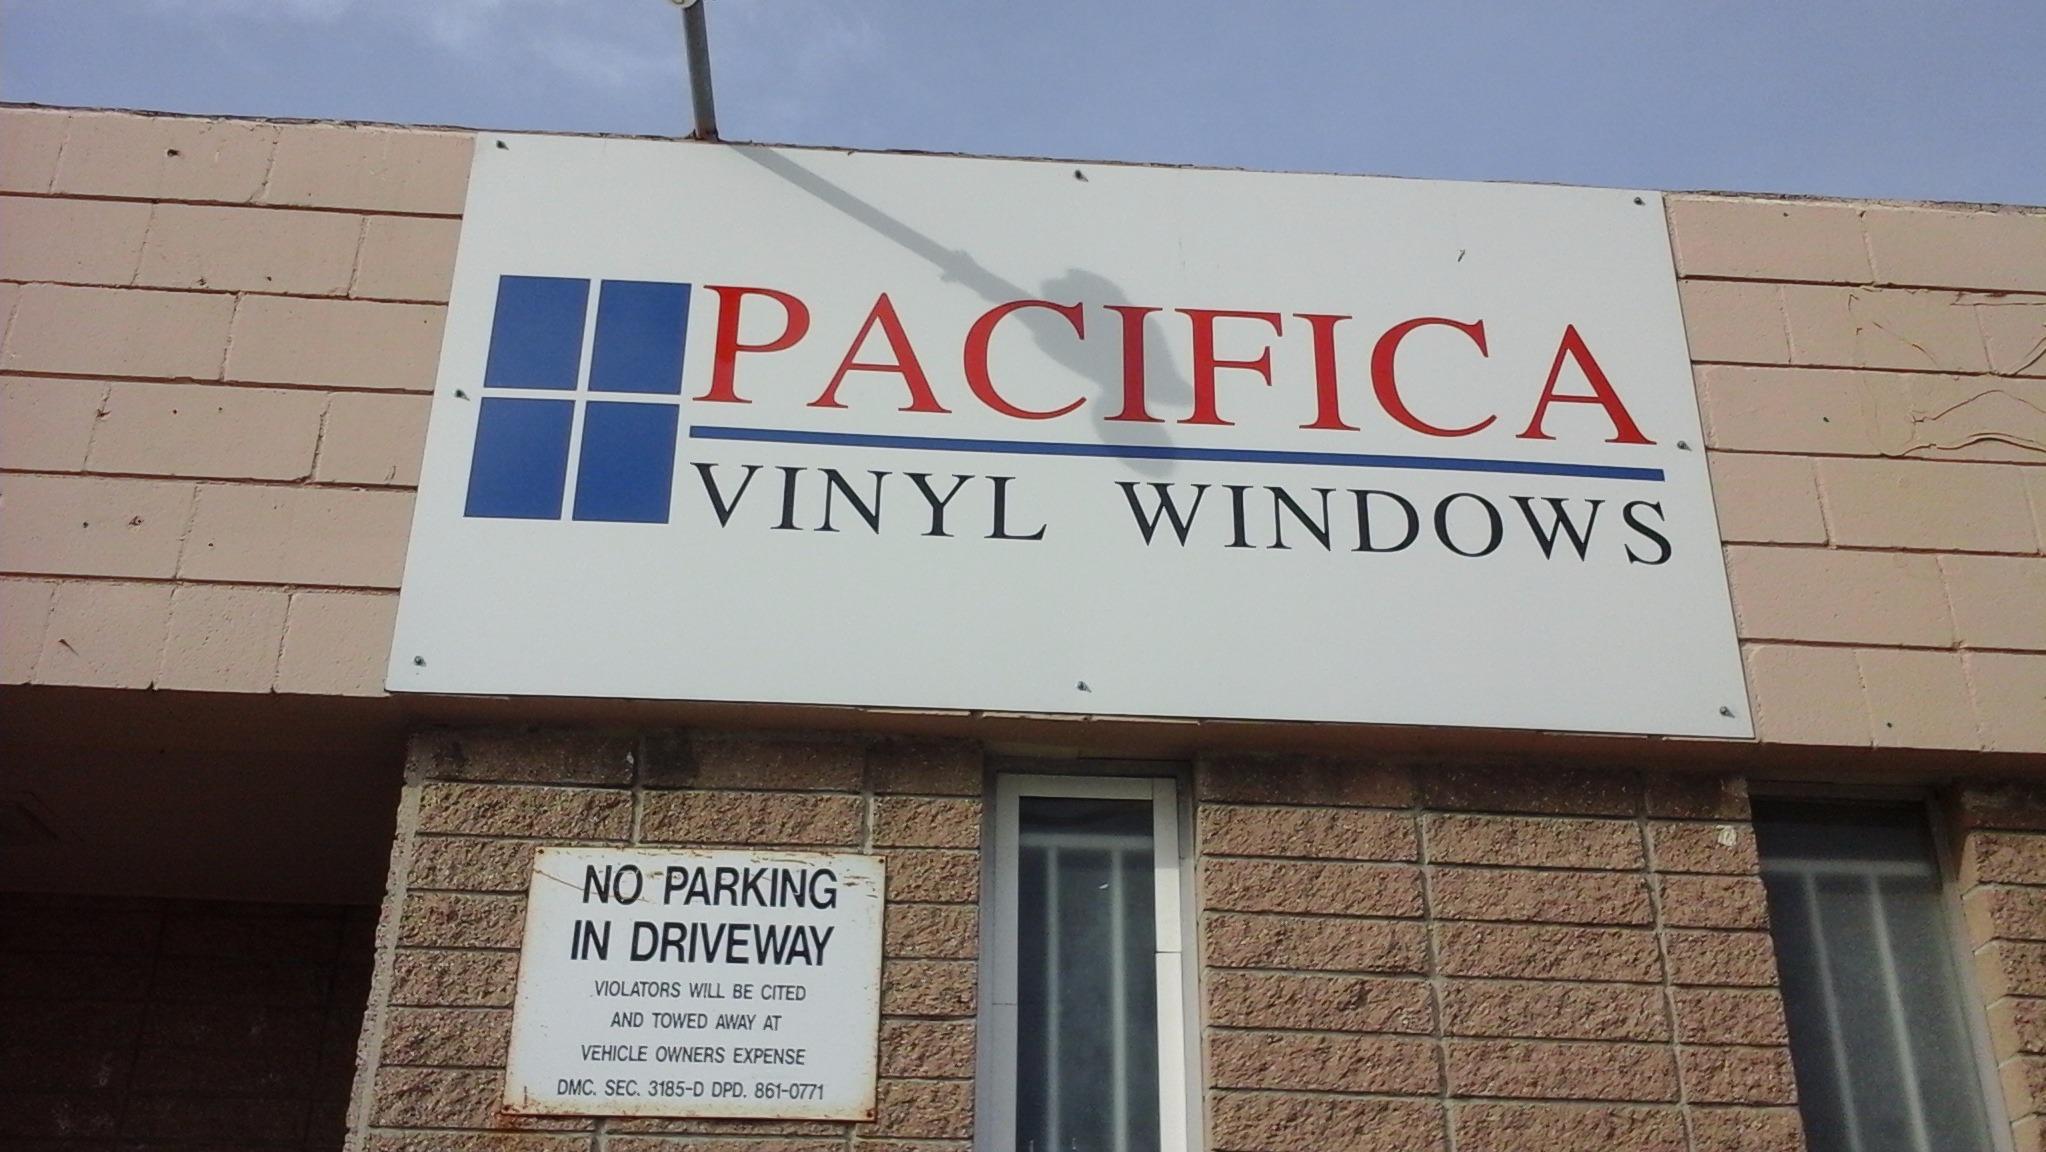 Pacifica Vinyl Windows In Downey Ca 90241